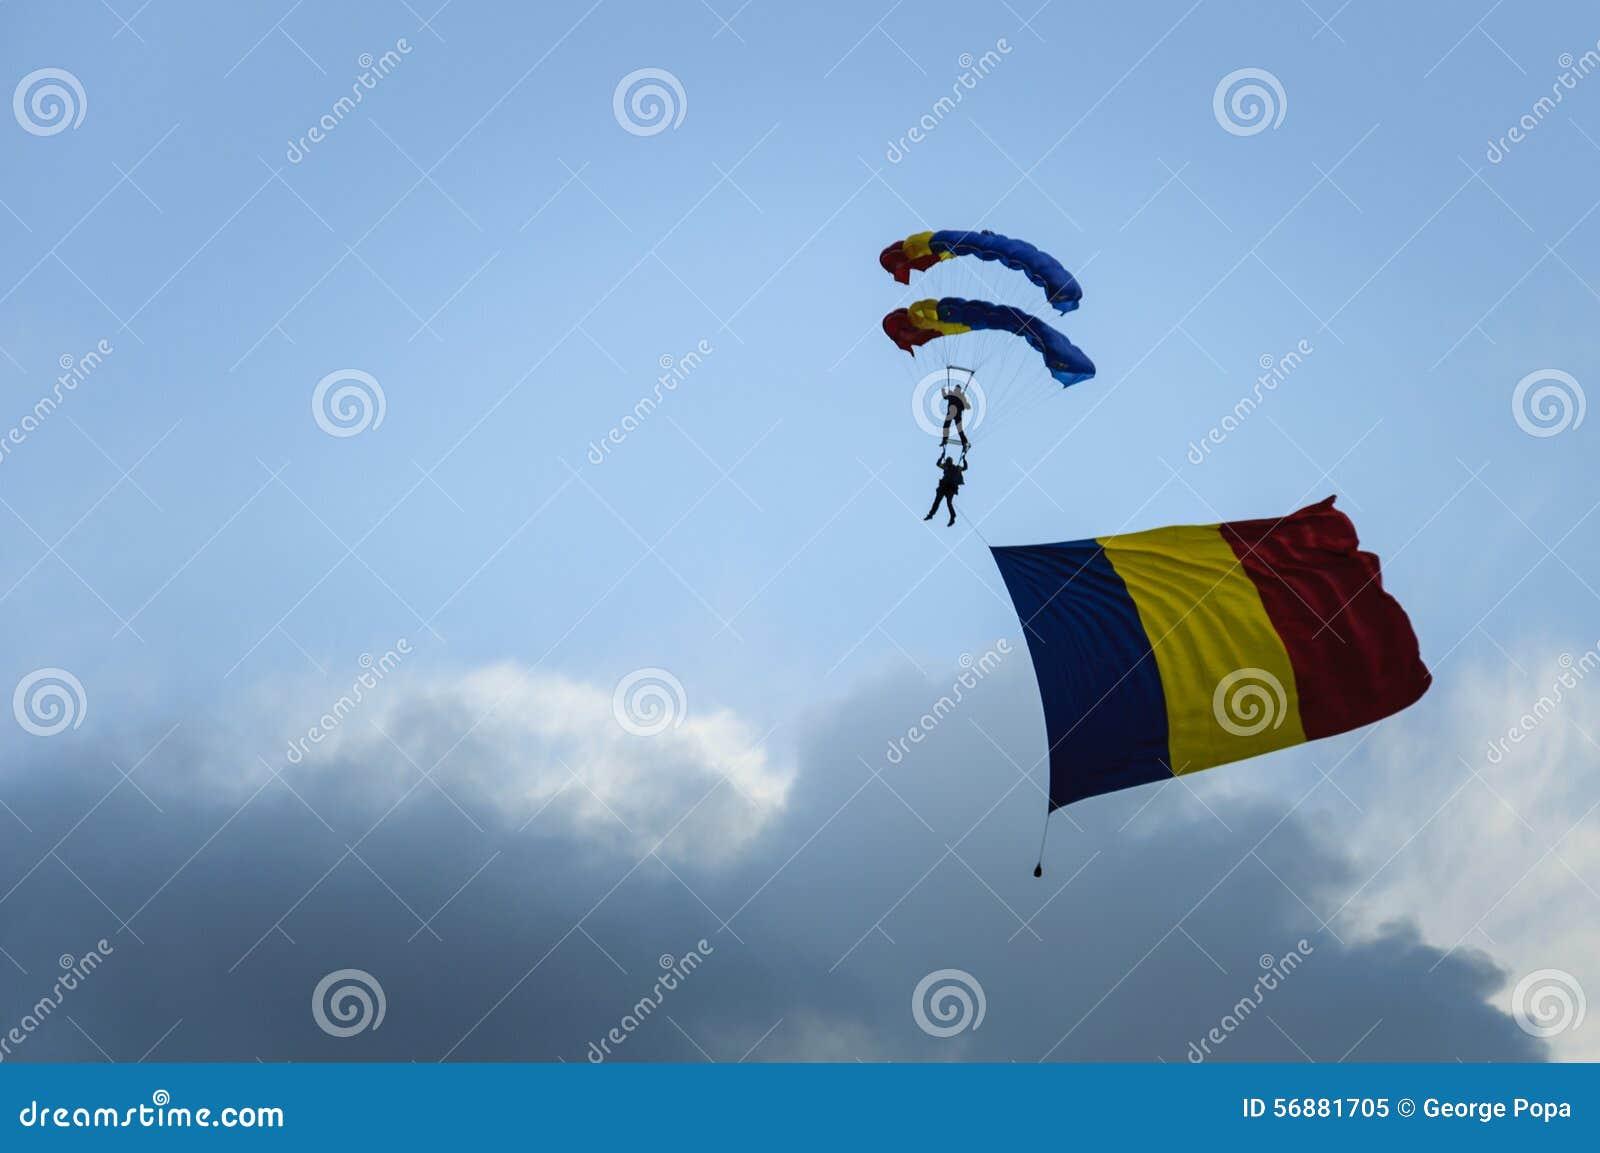 Manifestazione di acrobazie aeree